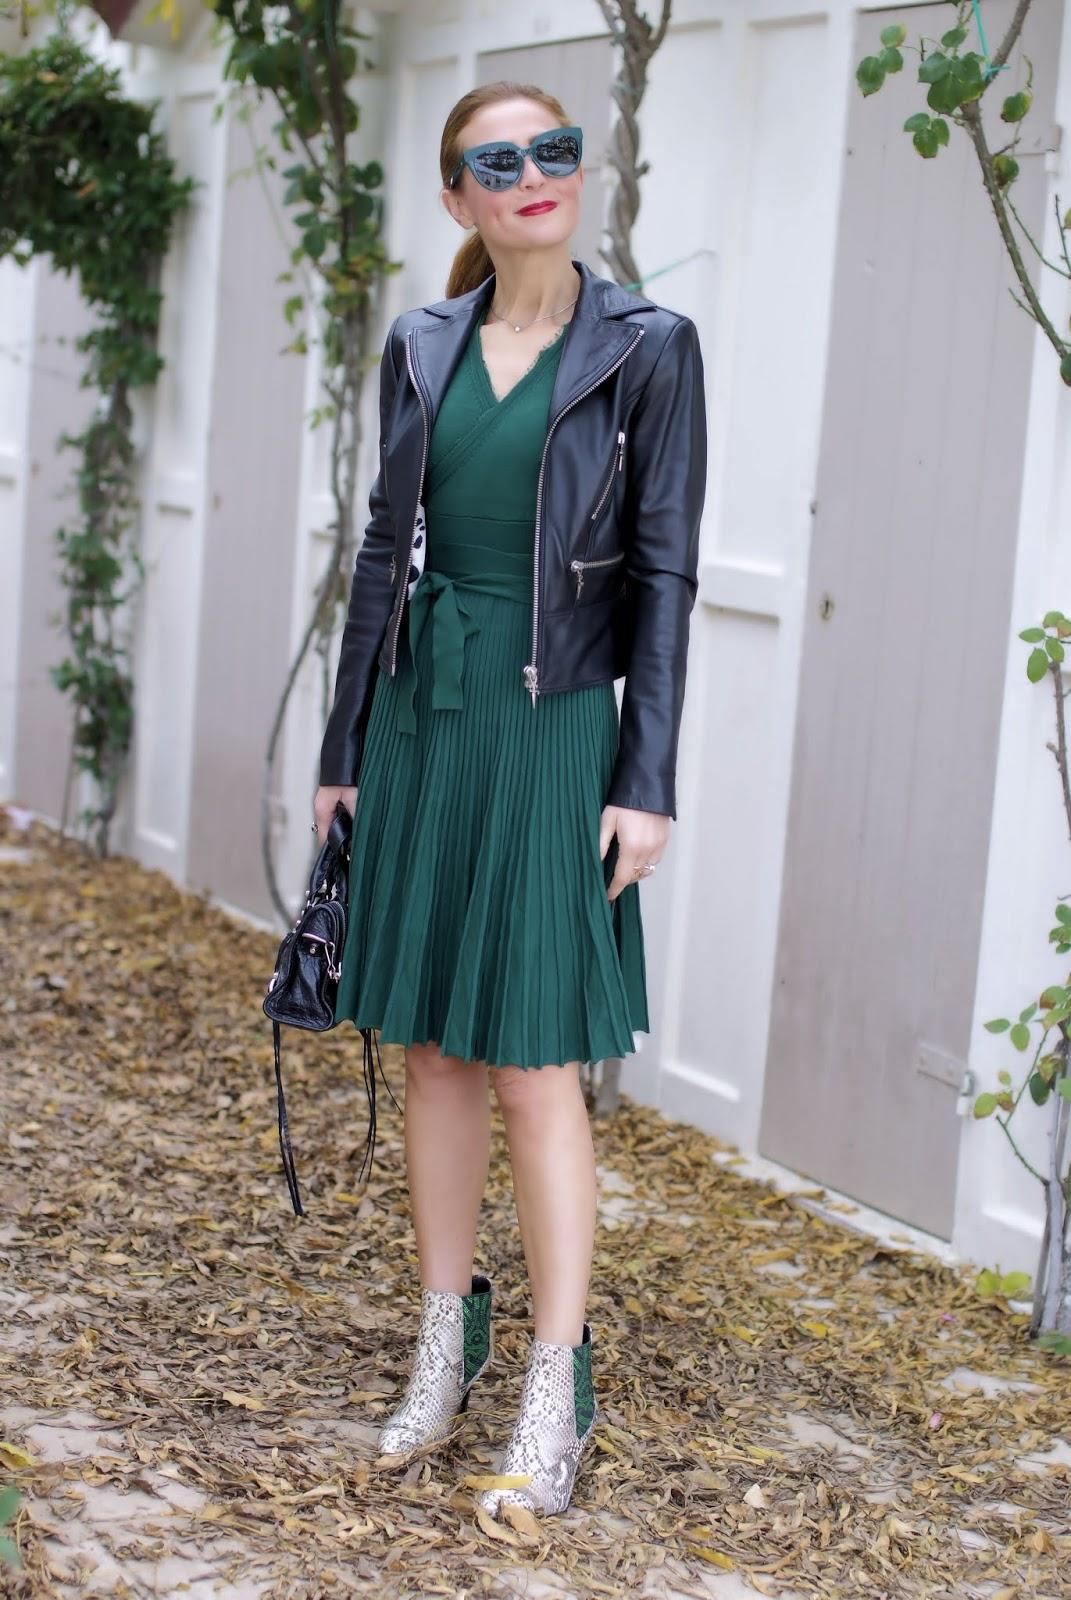 Metisu wrap neckline dress and python boots on Fashion and Cookies fashion blog, fashion blogger style